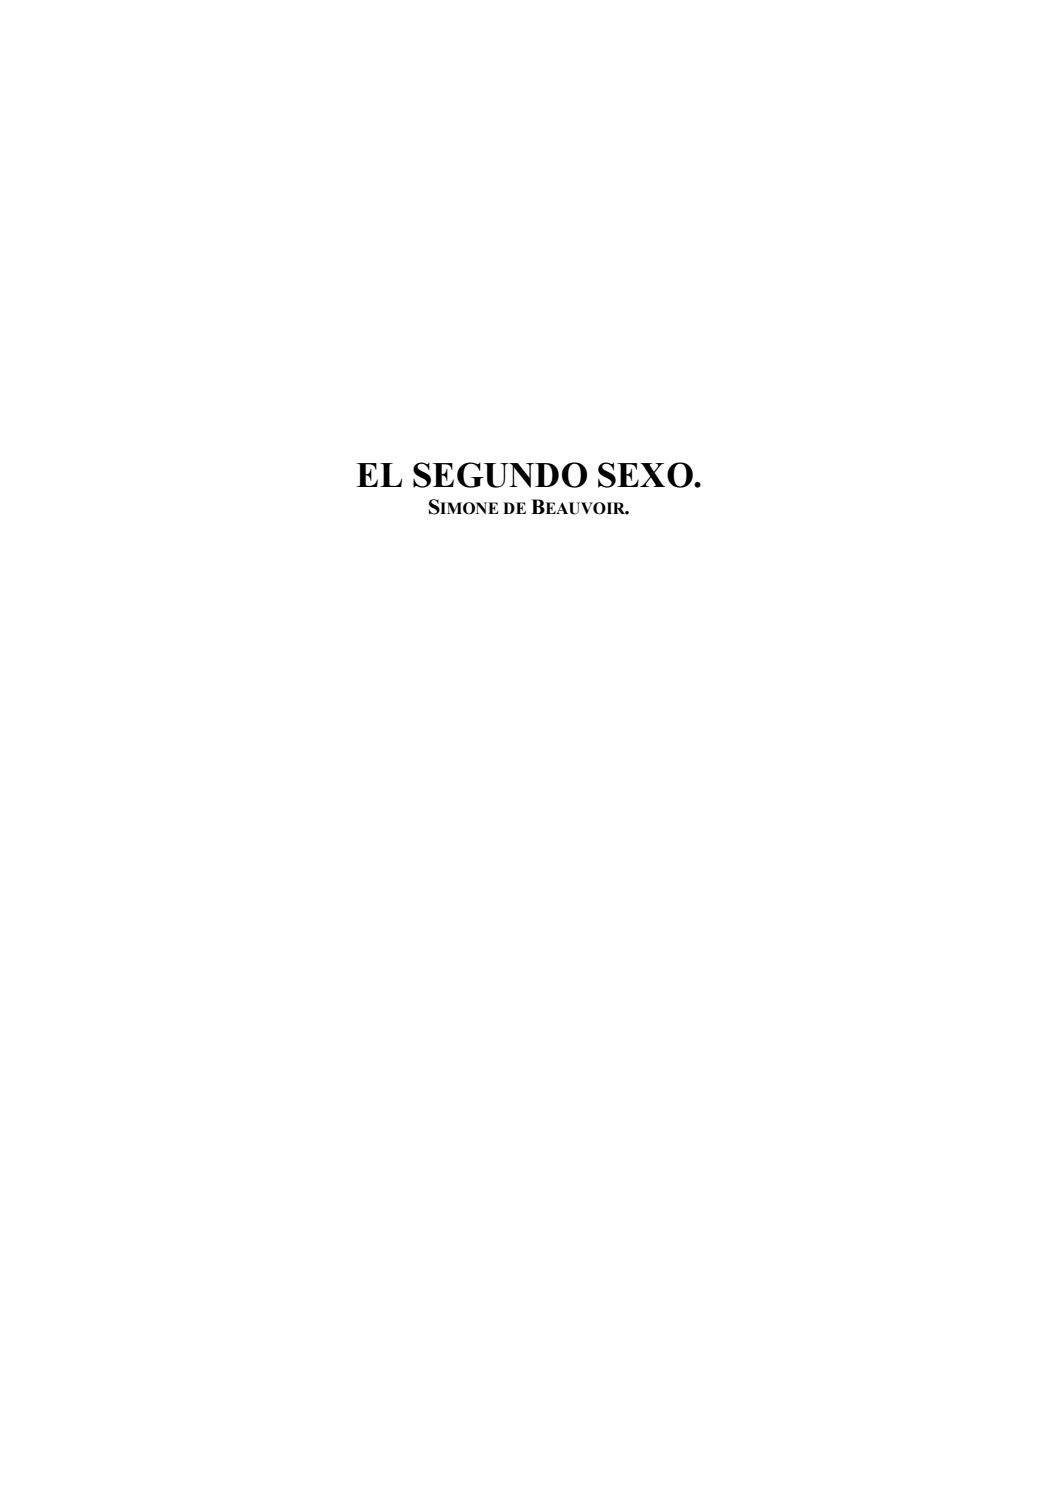 Un hombre me–178176